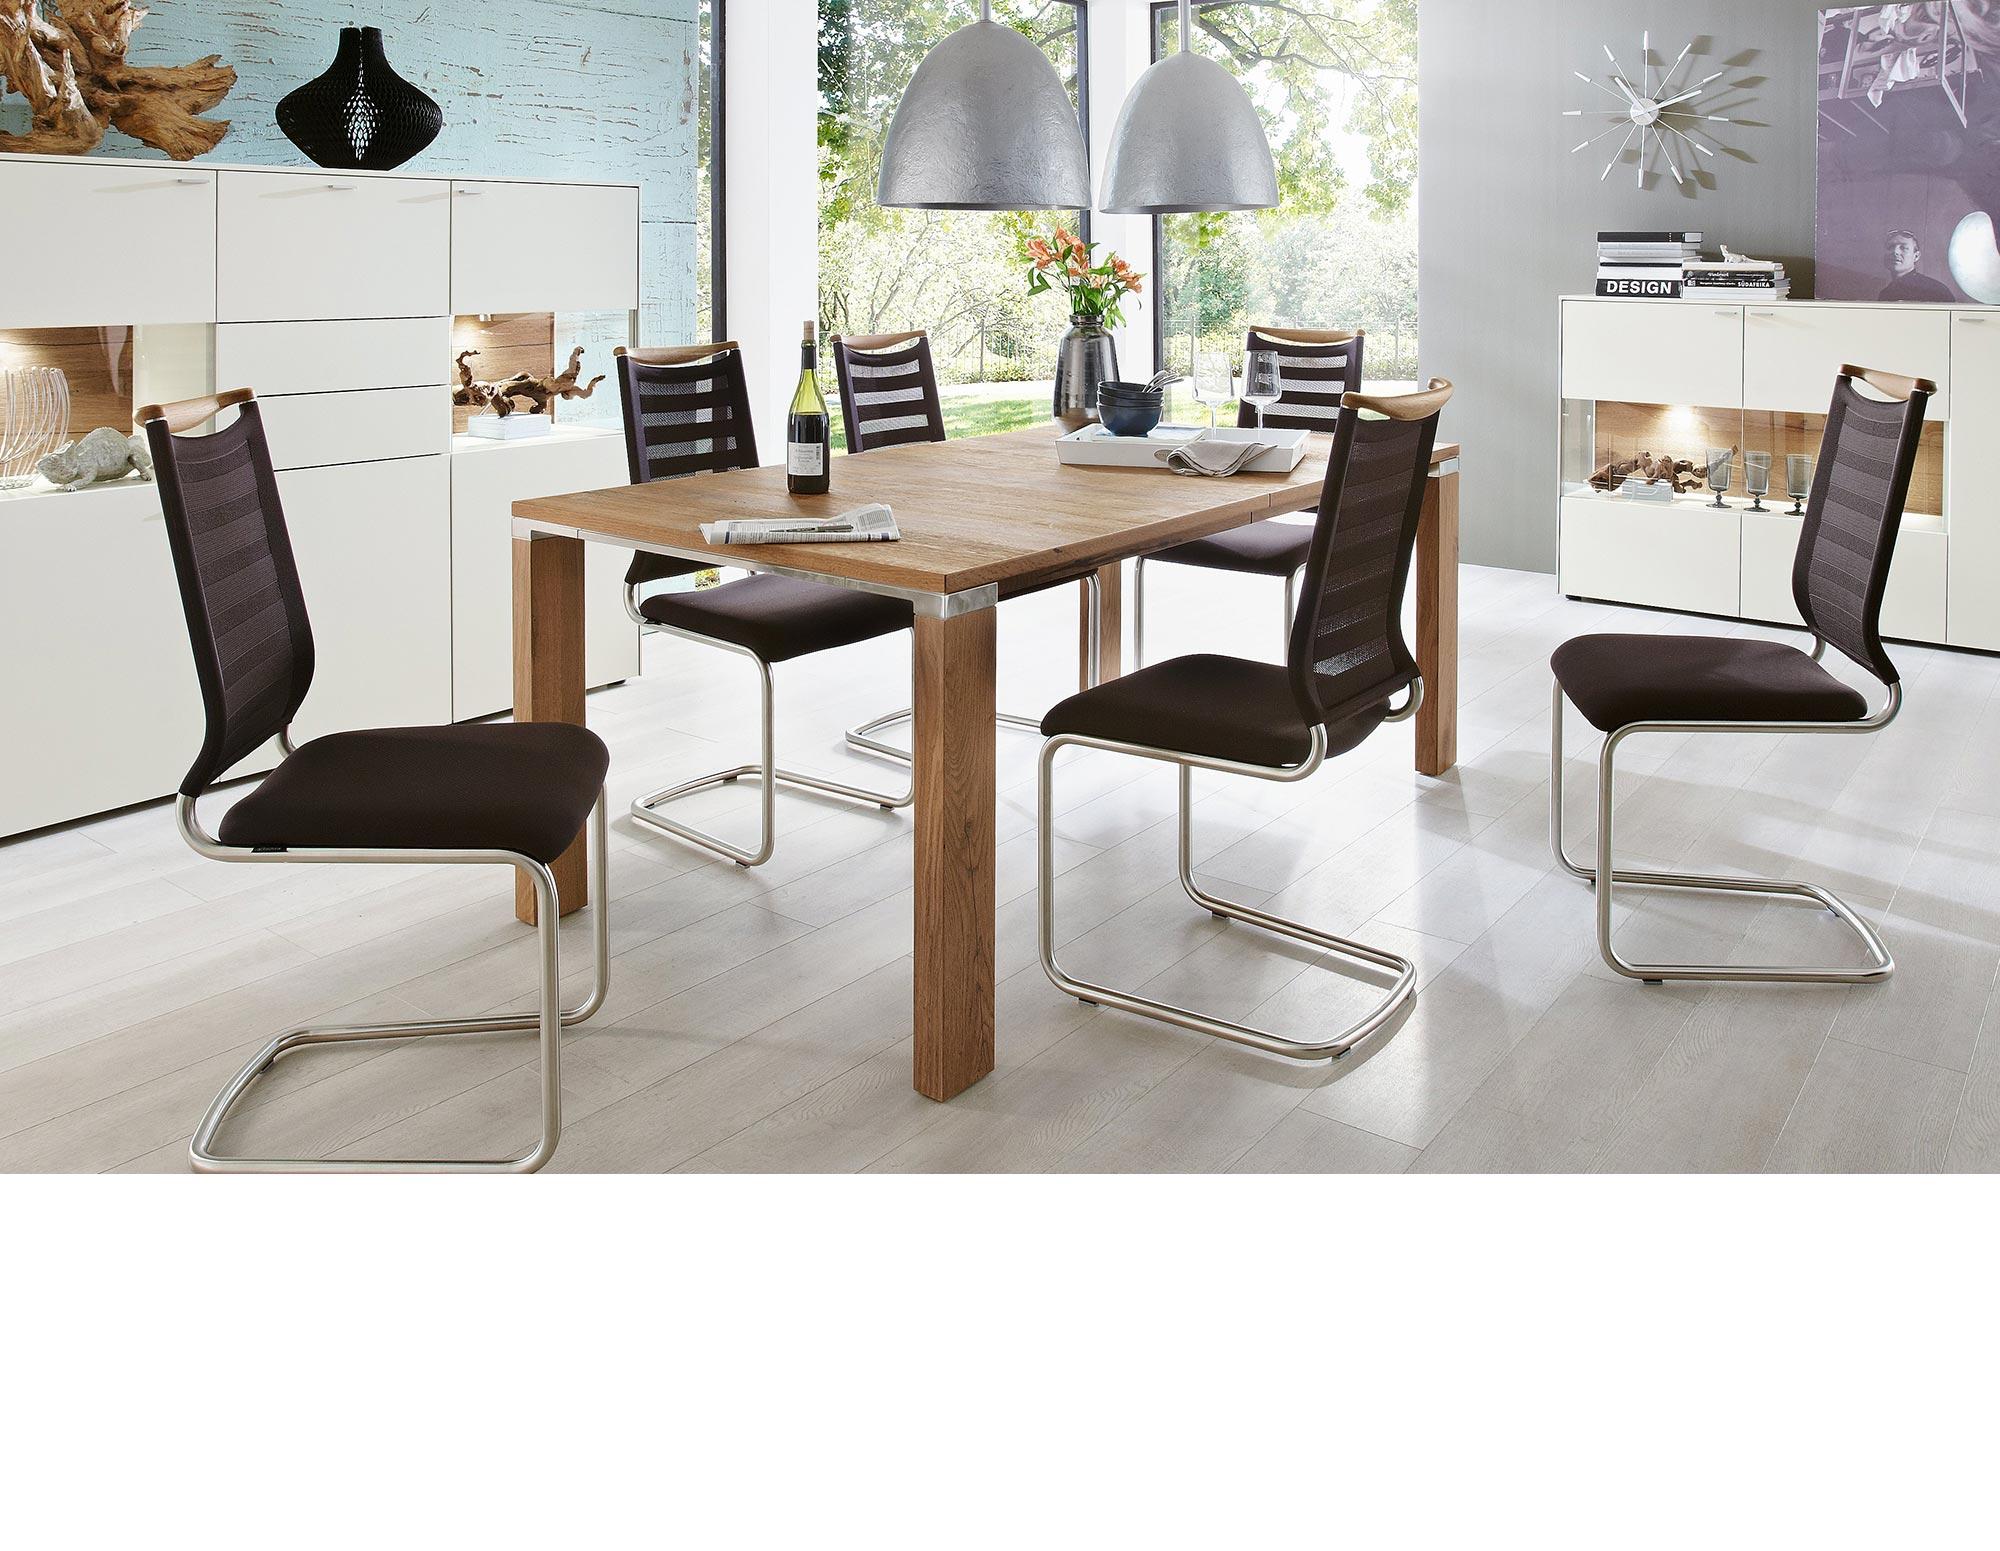 anfahrt zu m bel b cker. Black Bedroom Furniture Sets. Home Design Ideas